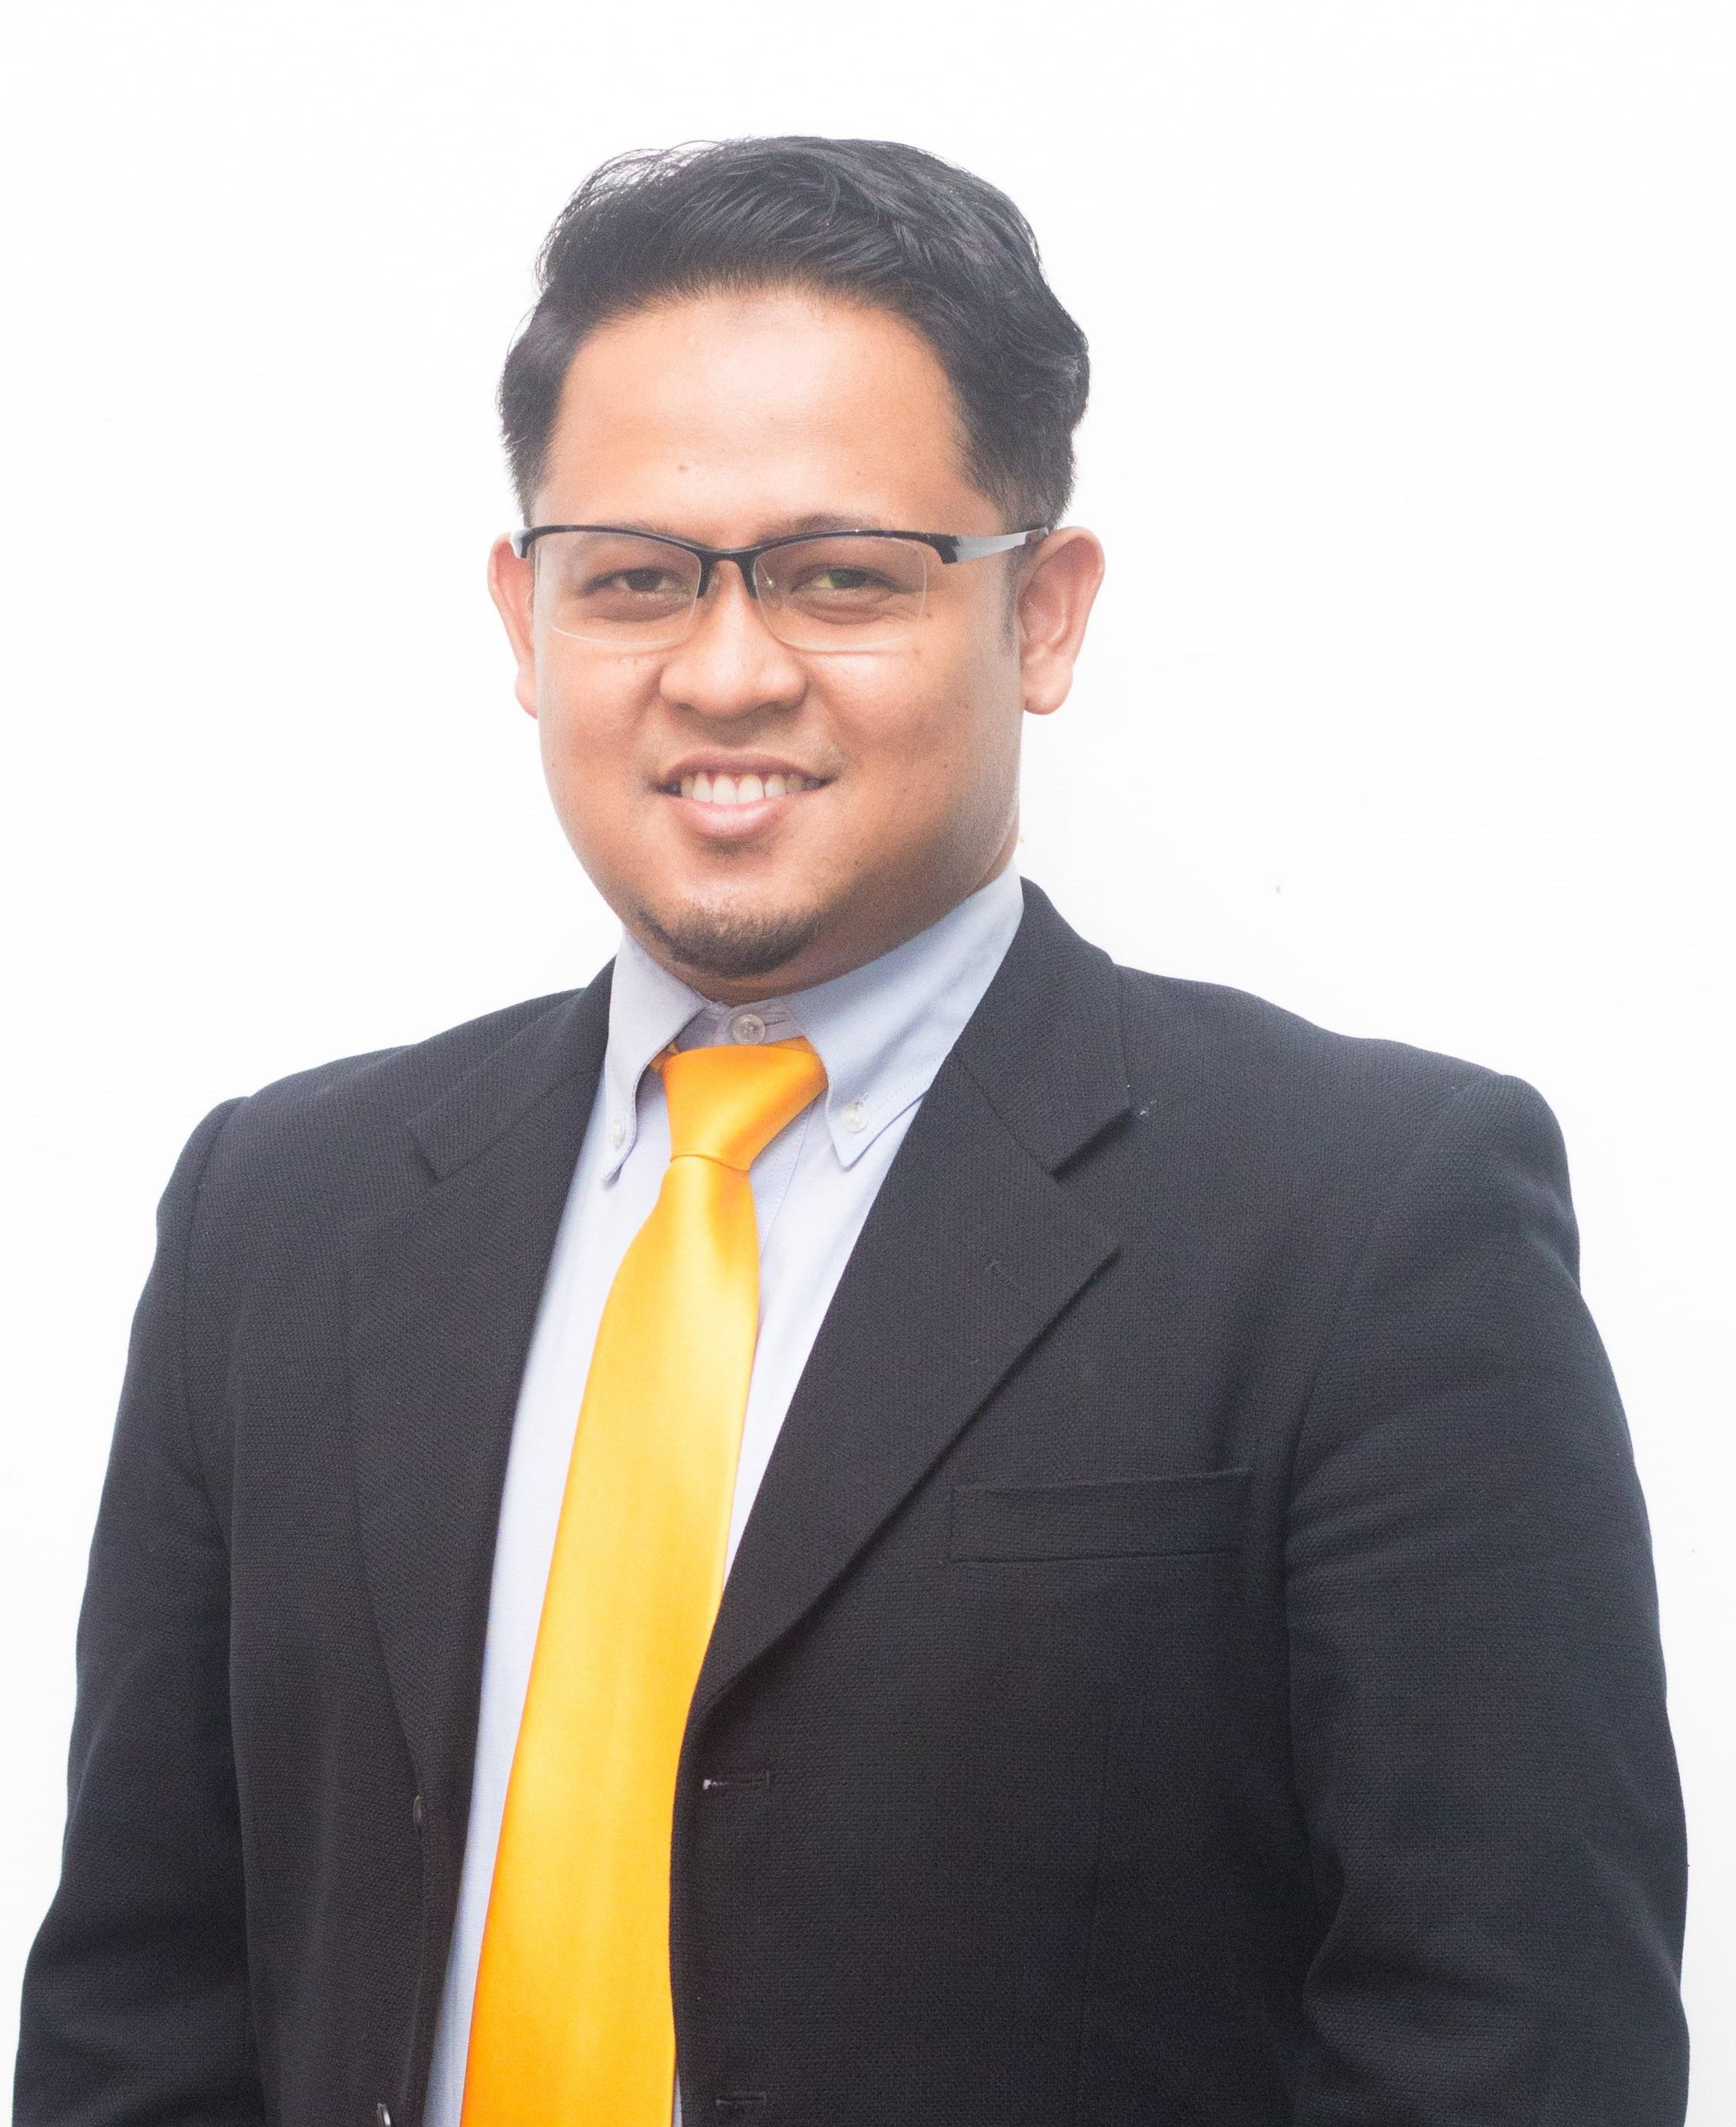 Abdul Hafidz Yusoff